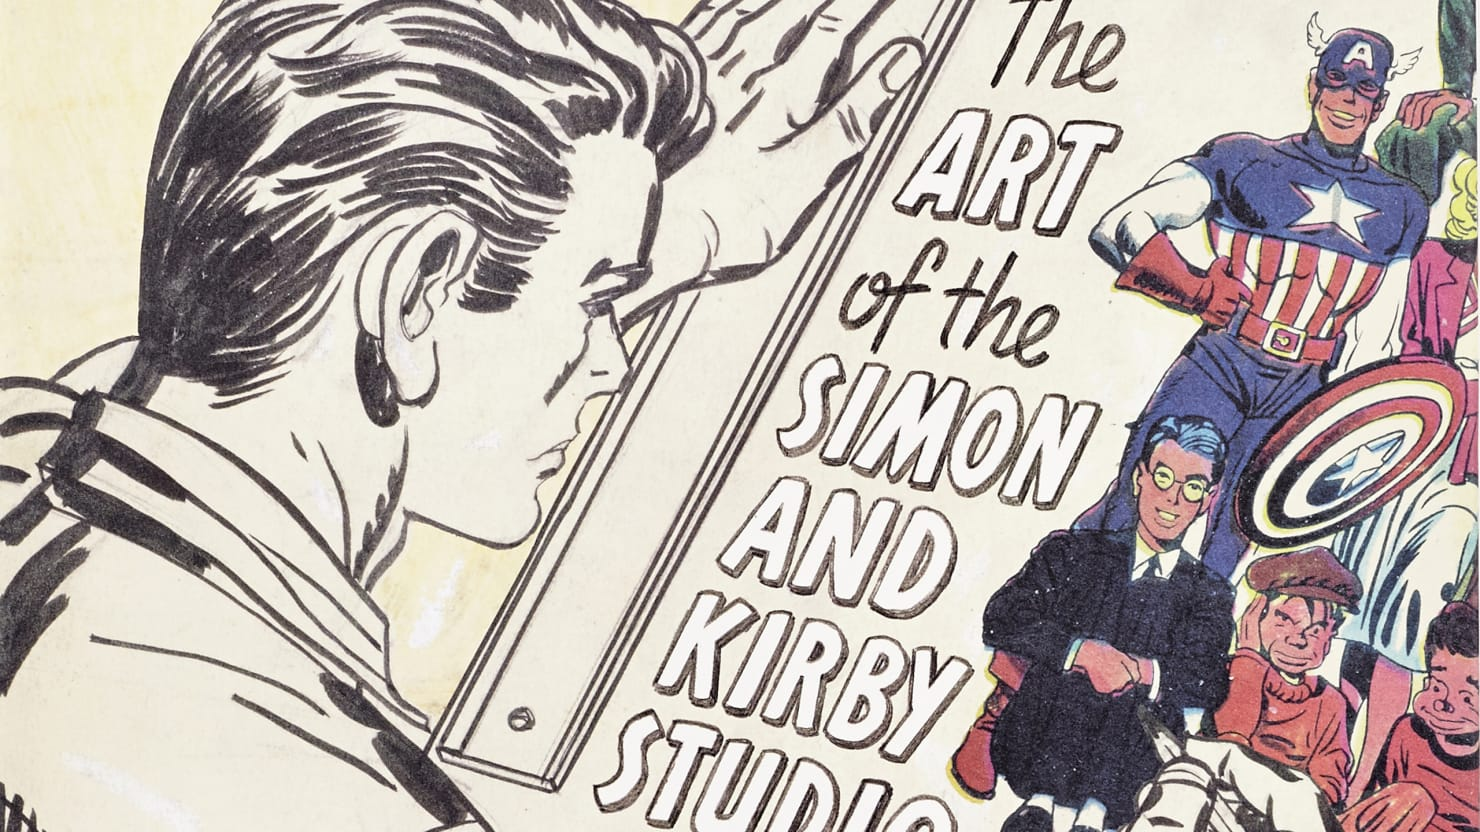 Comic Books' True Origin Story: 'The Art of Joe Simon and Jack Kirby'